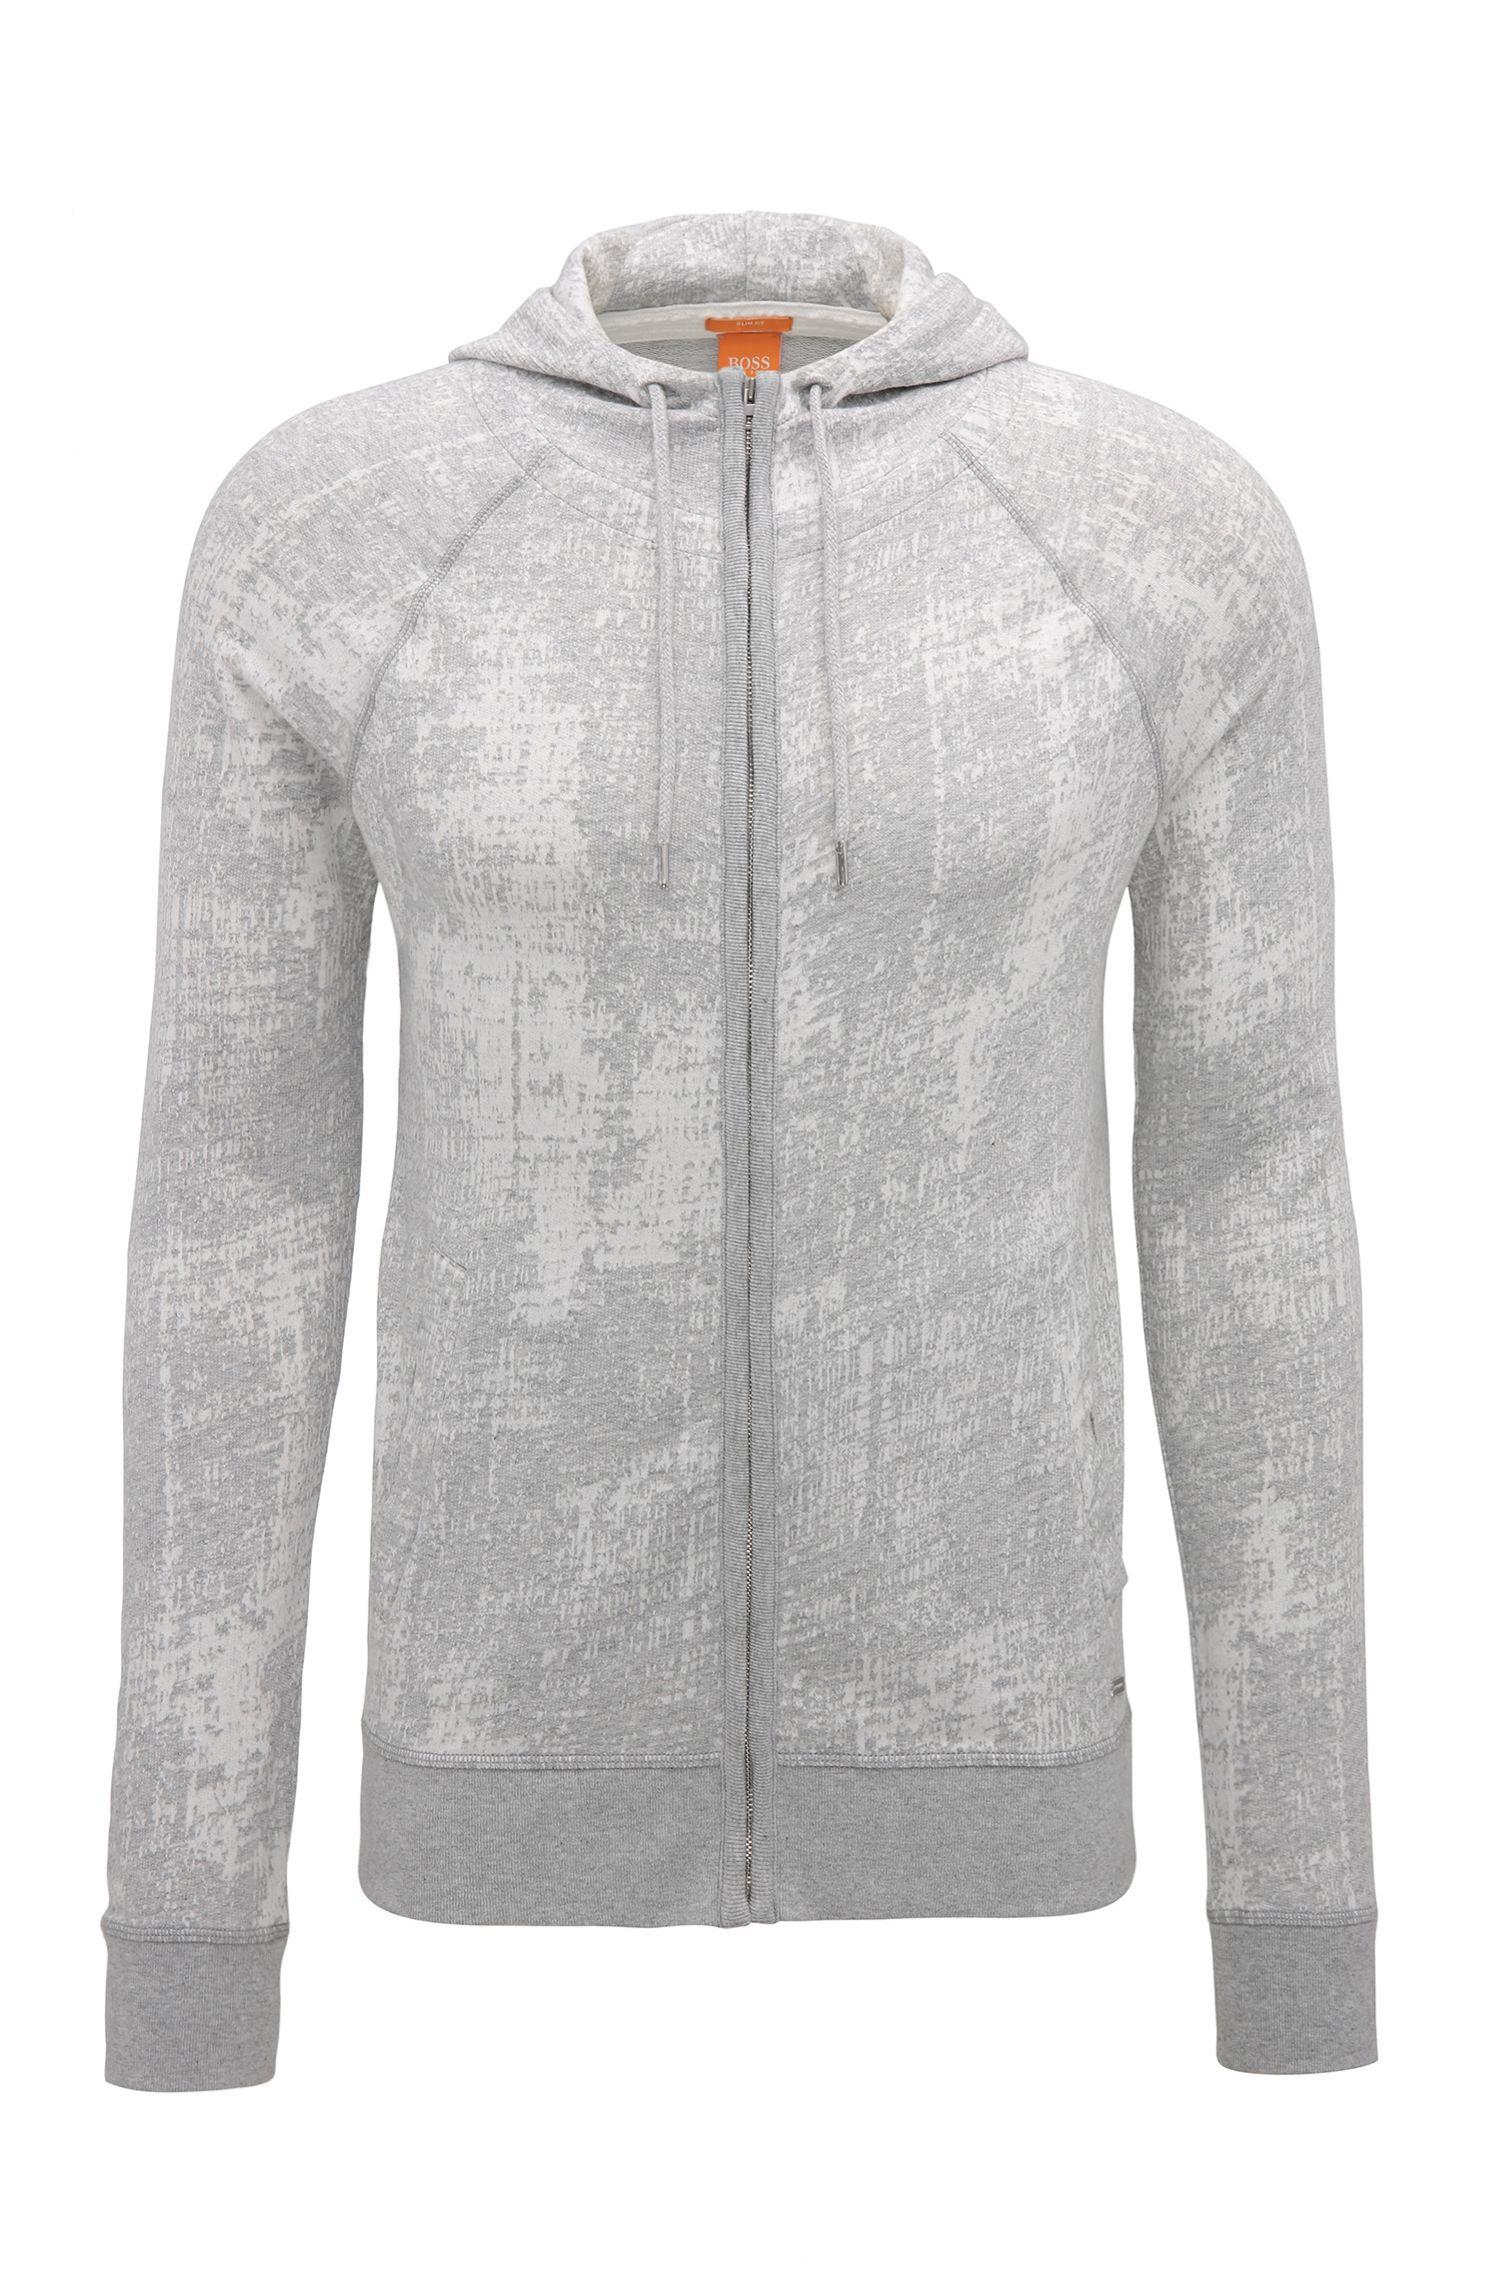 'Zpot' | Slim Fit, Cotton Hooded Sweatshirt